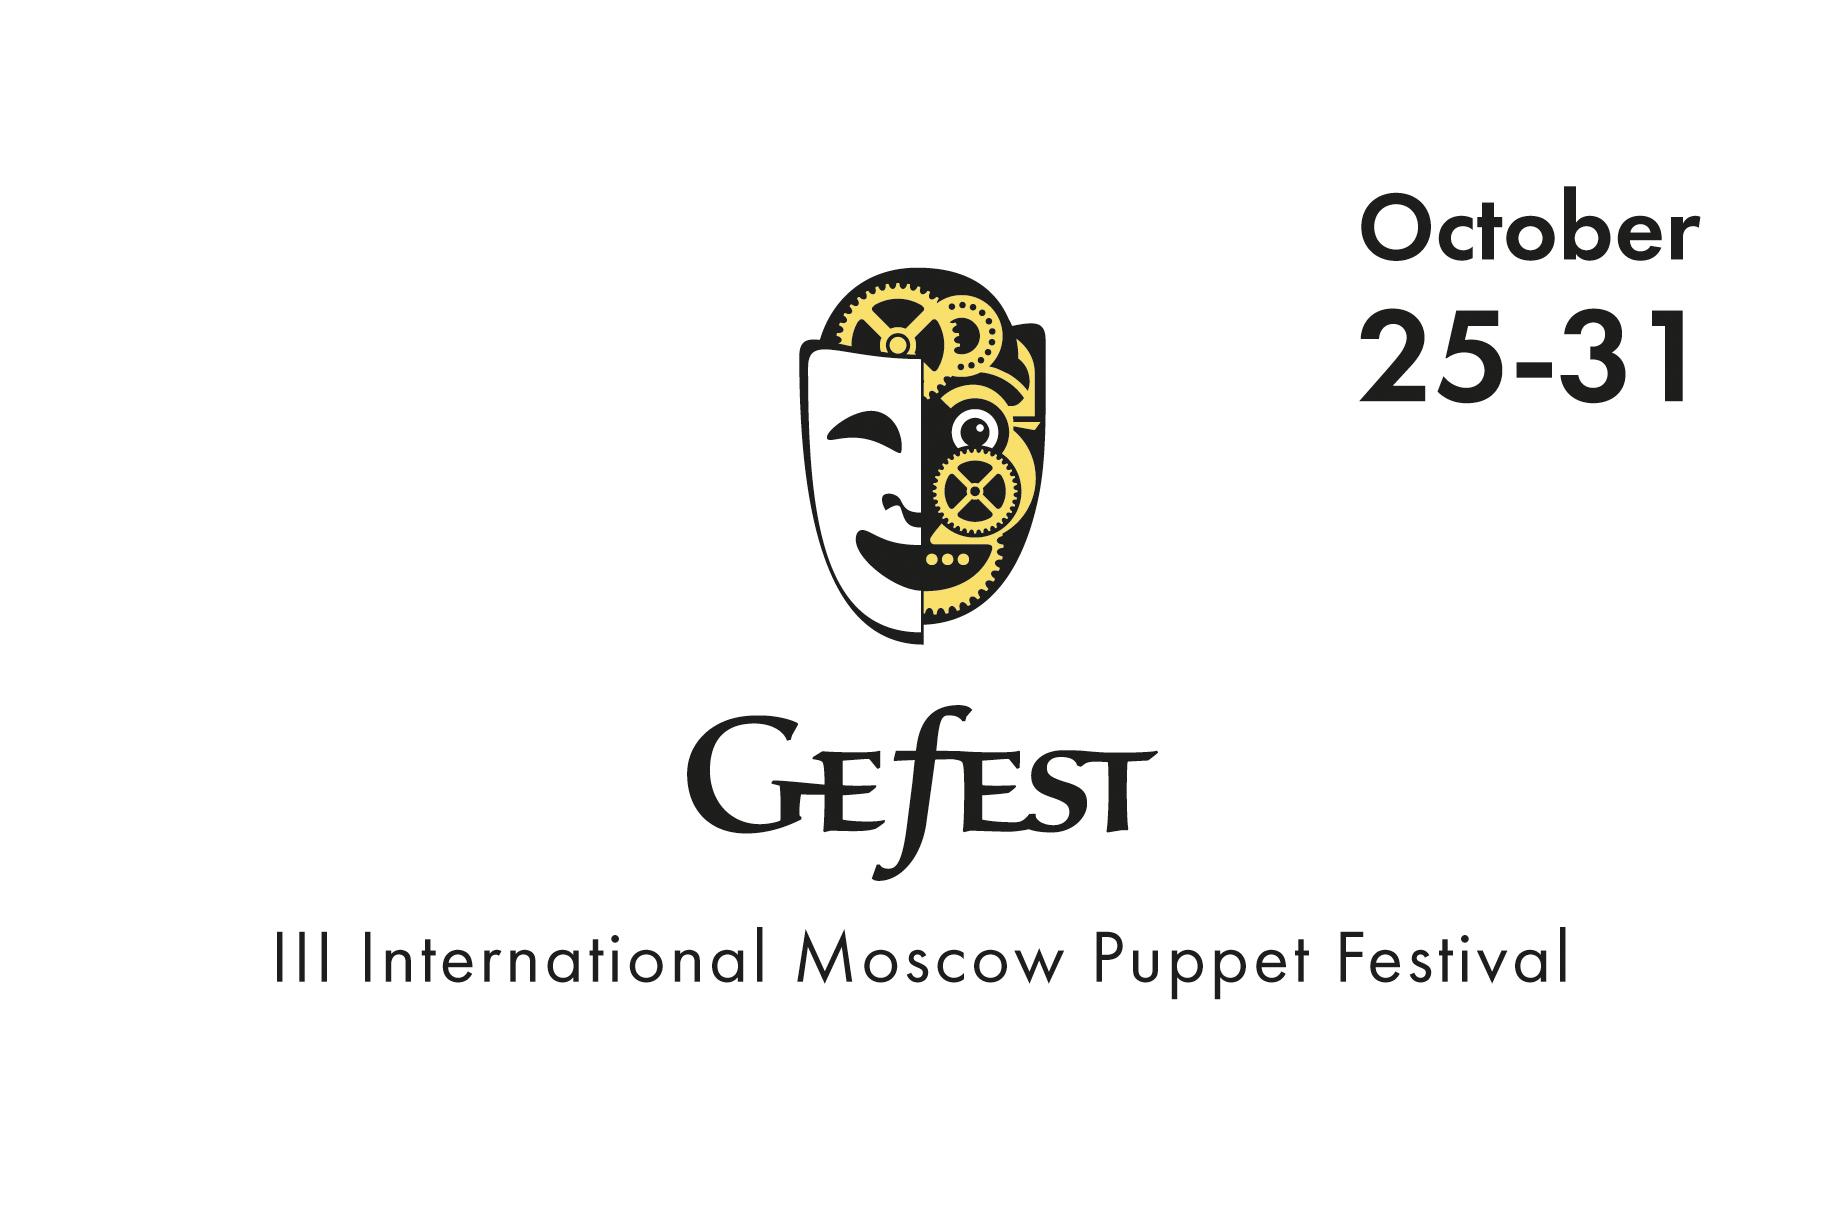 Gefest - III International Moscow Puppet Festival